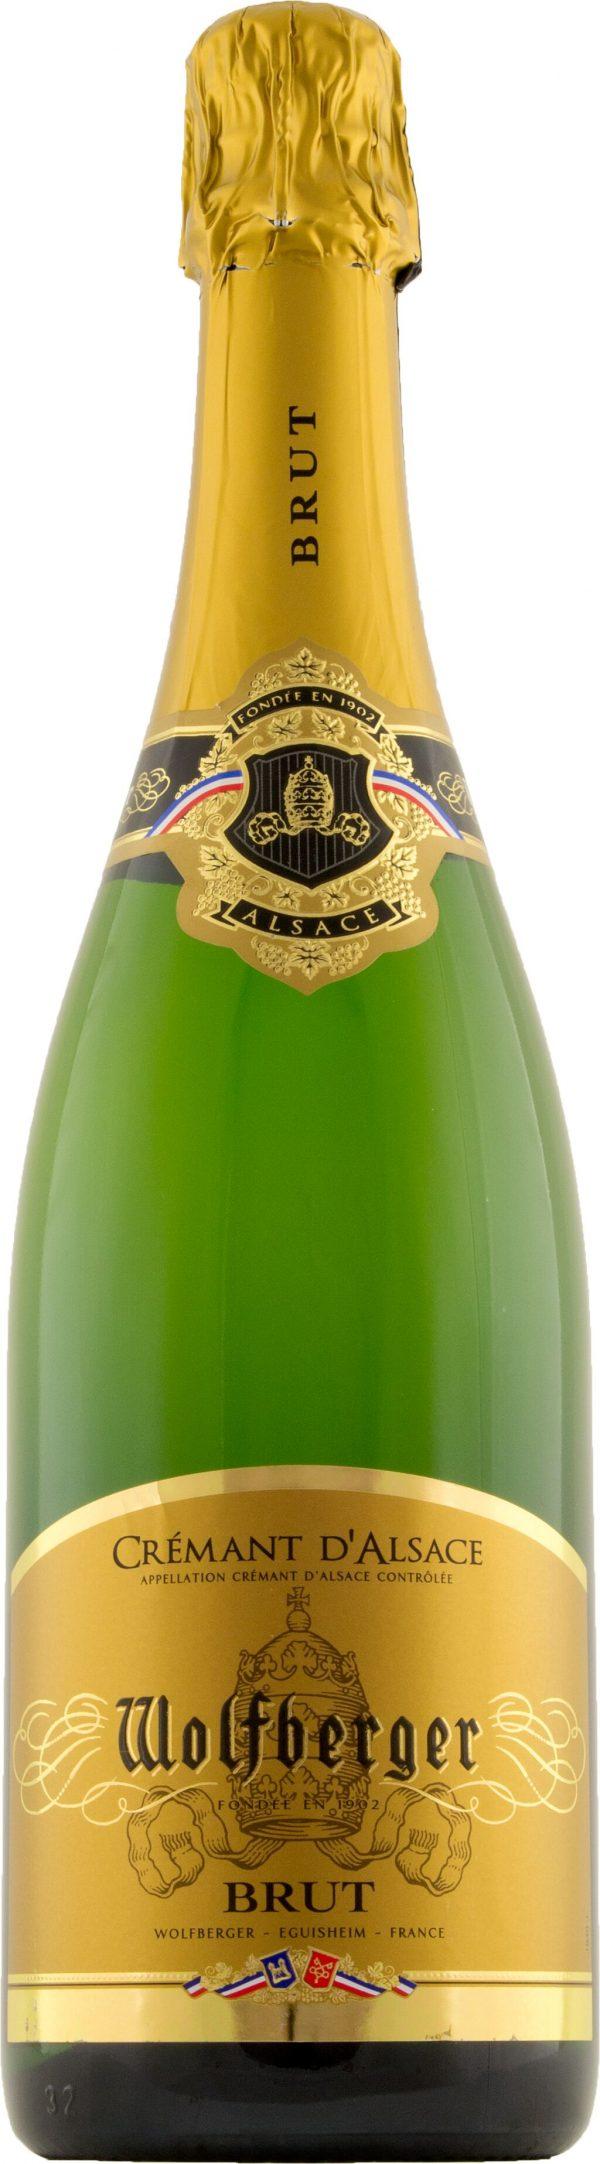 Wolfberger Cremant d'Alsace Brut 75cl